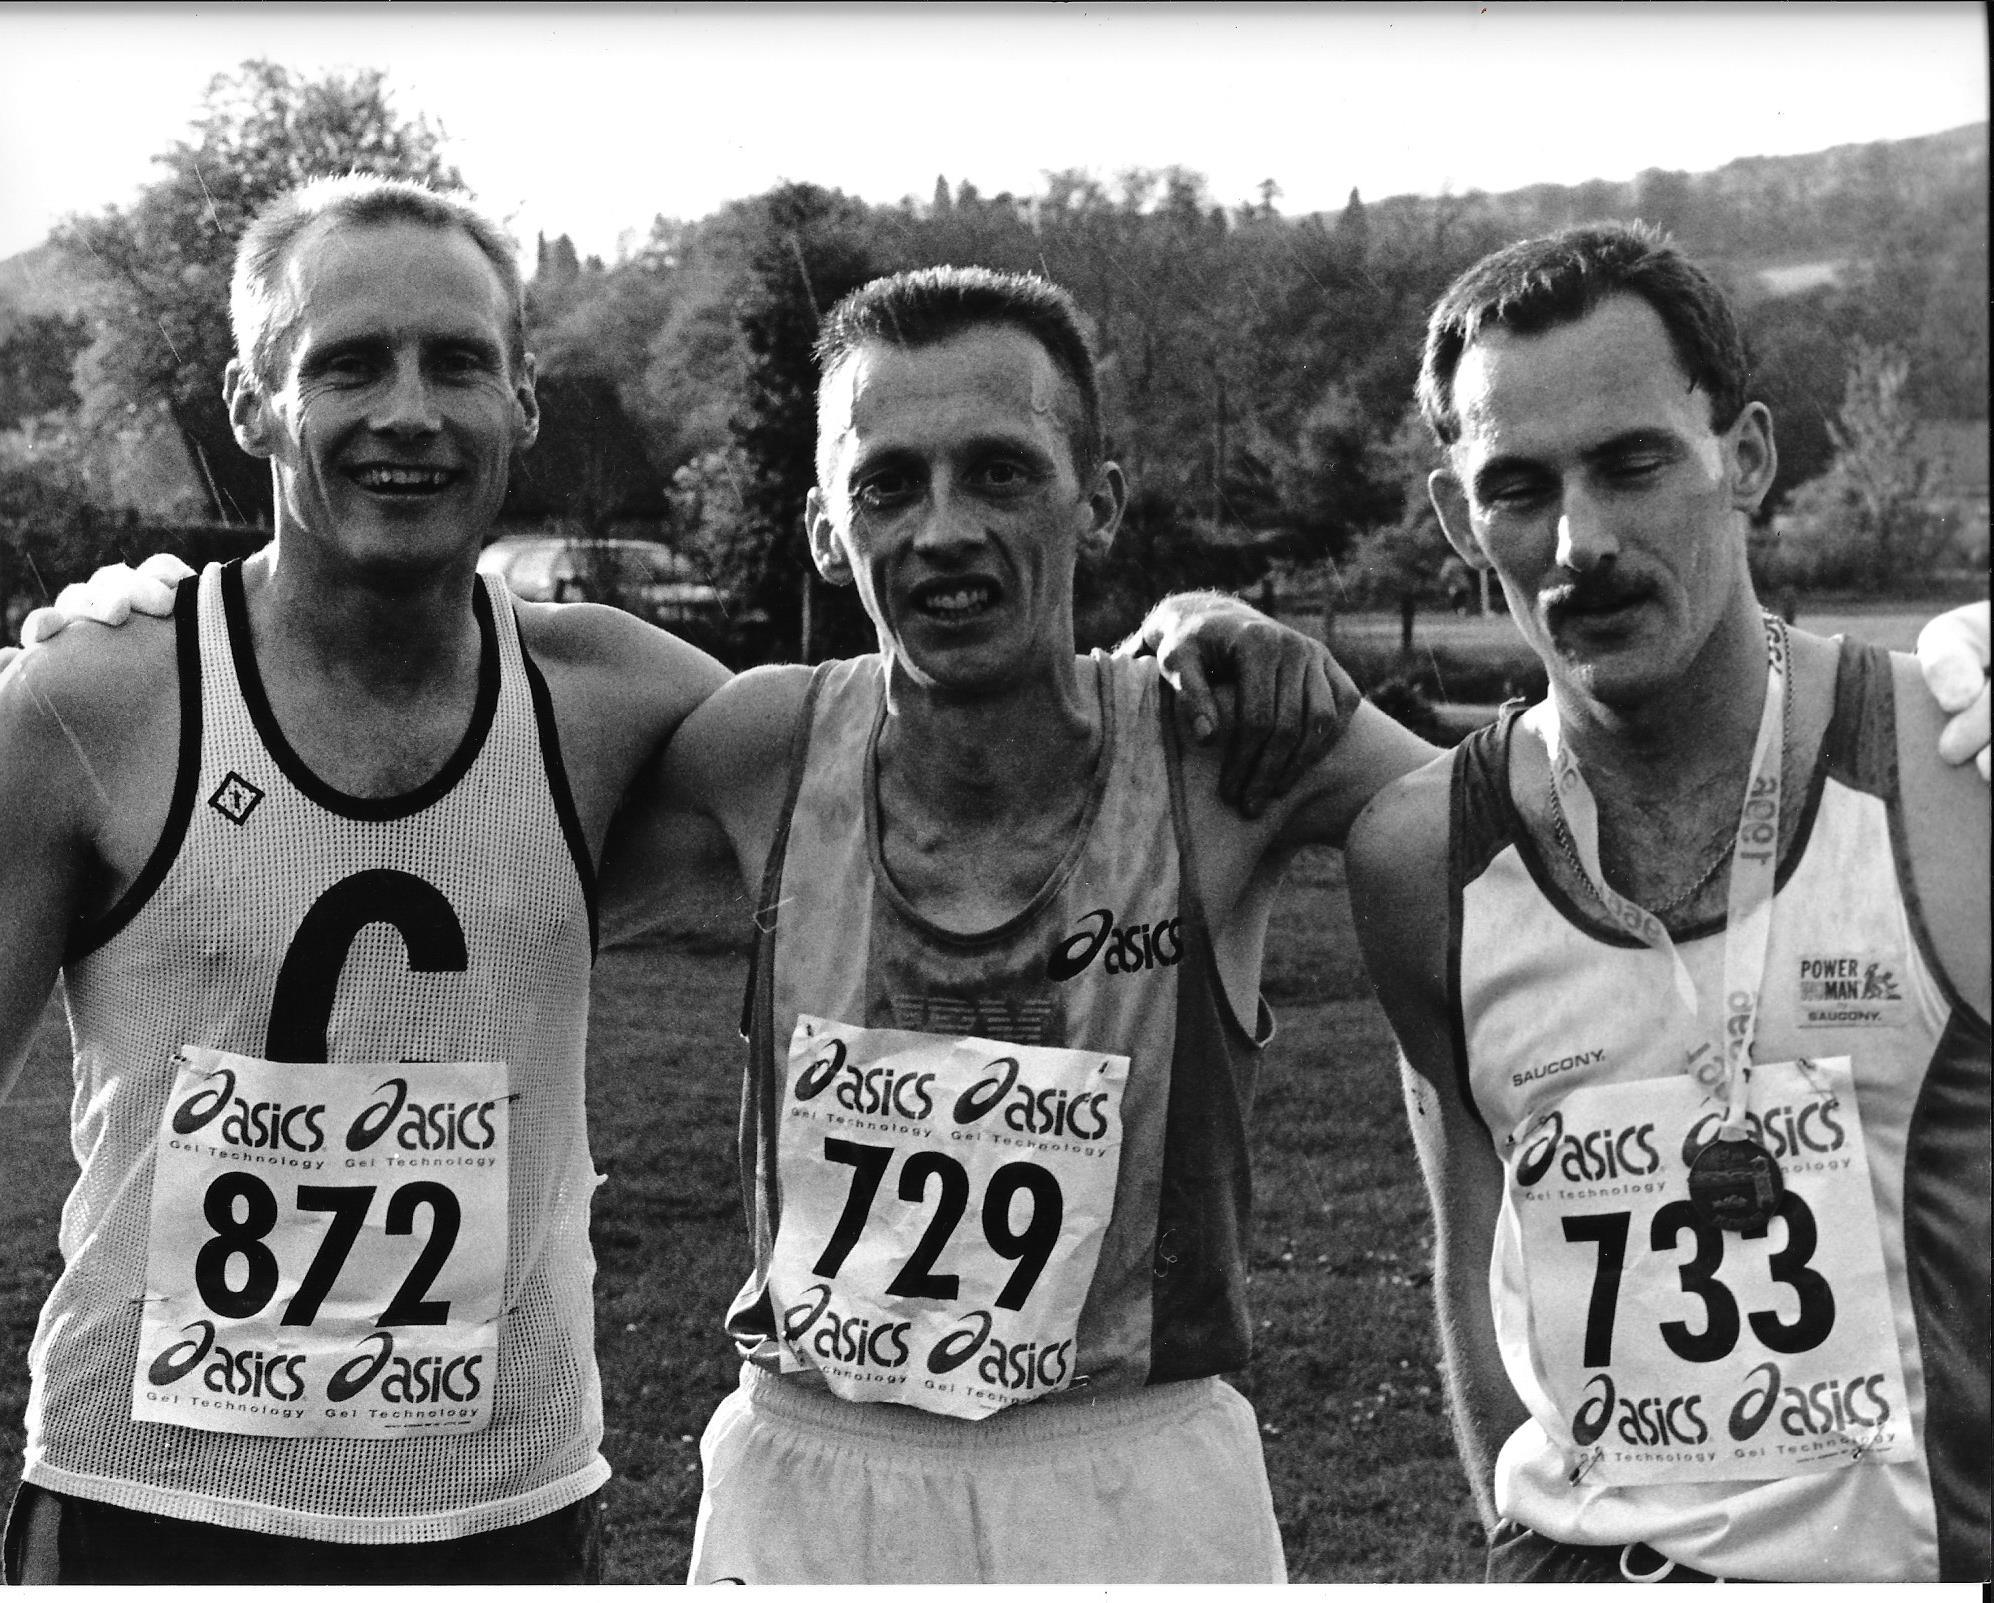 I Murphy, T Murray, G Croll, Polaroid Hel 96